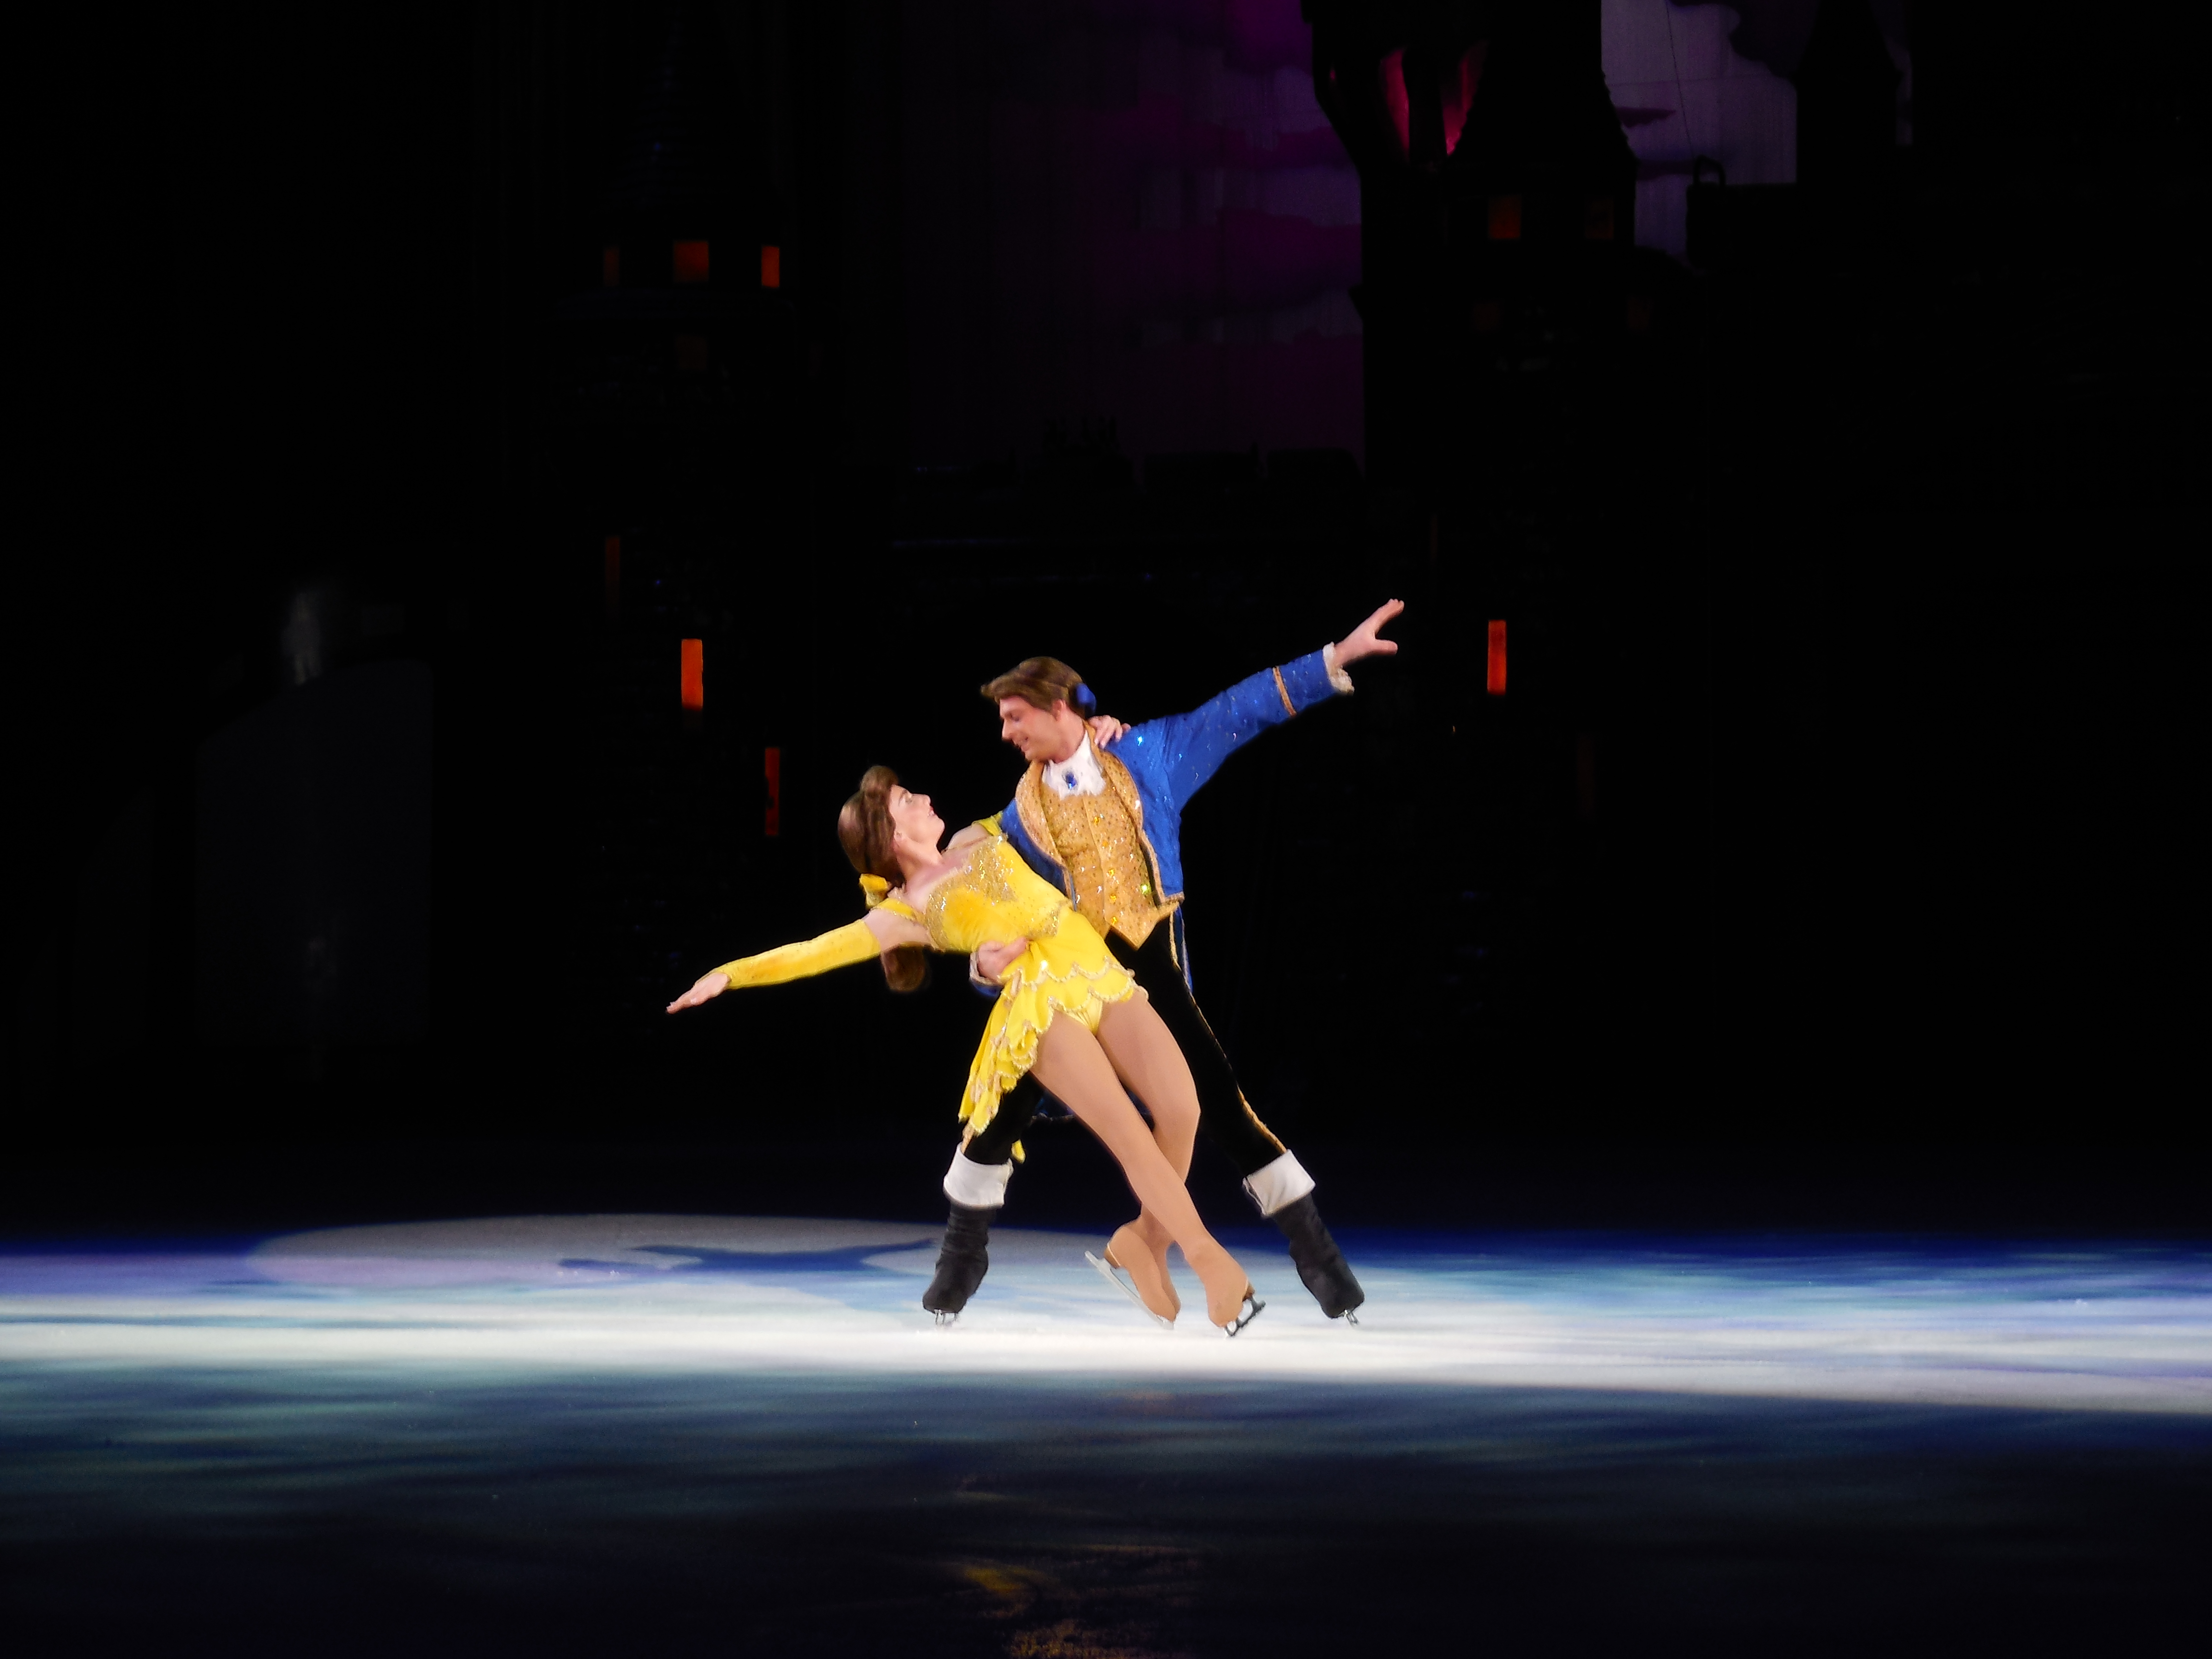 Disney on Ice Nassau Coliseum